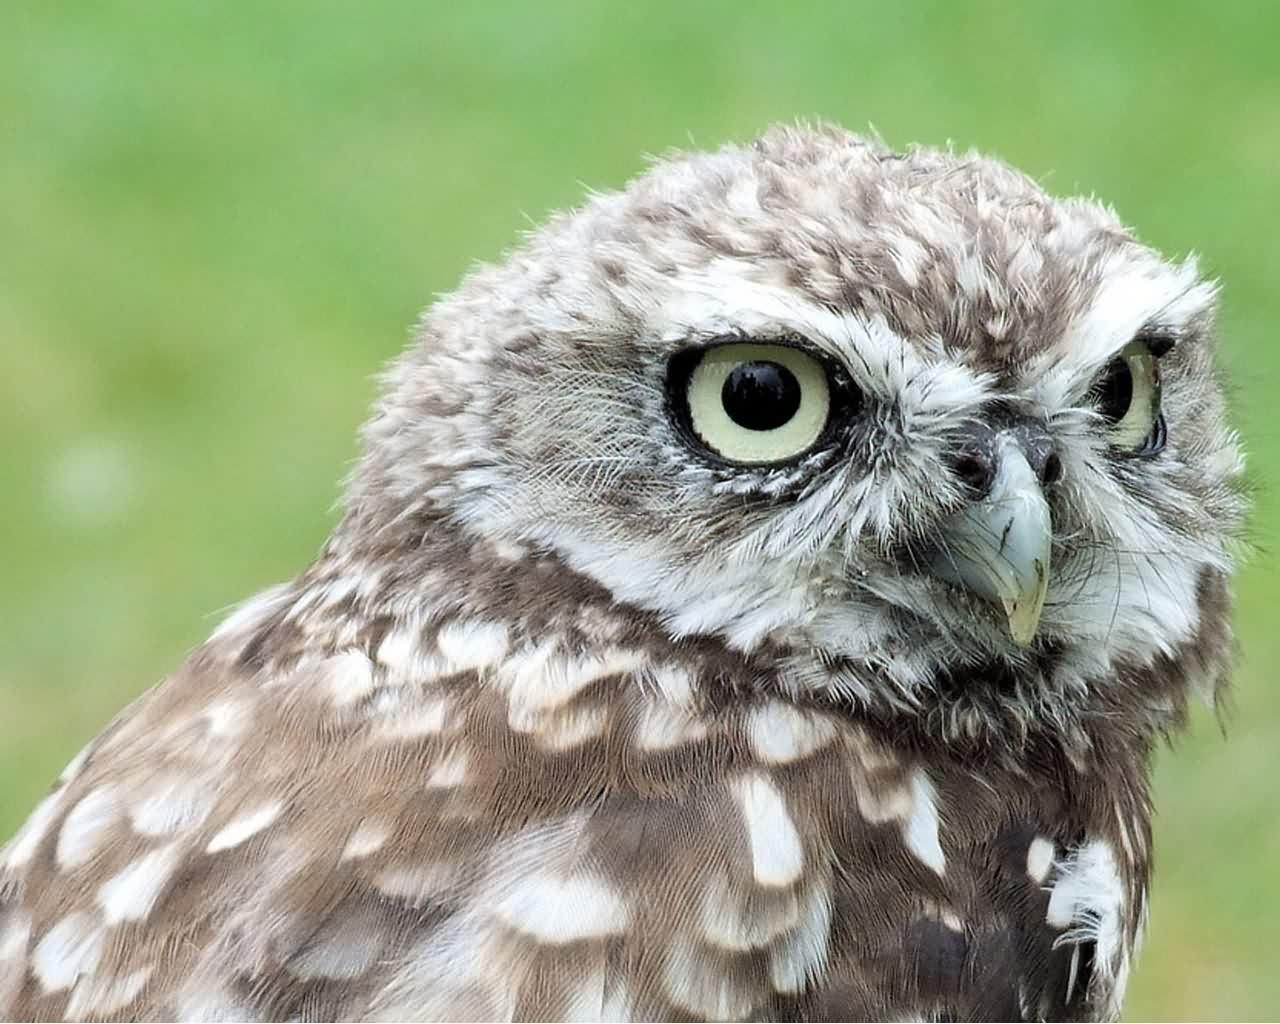 cool hd nature desktop wallpapers owl wallpapers